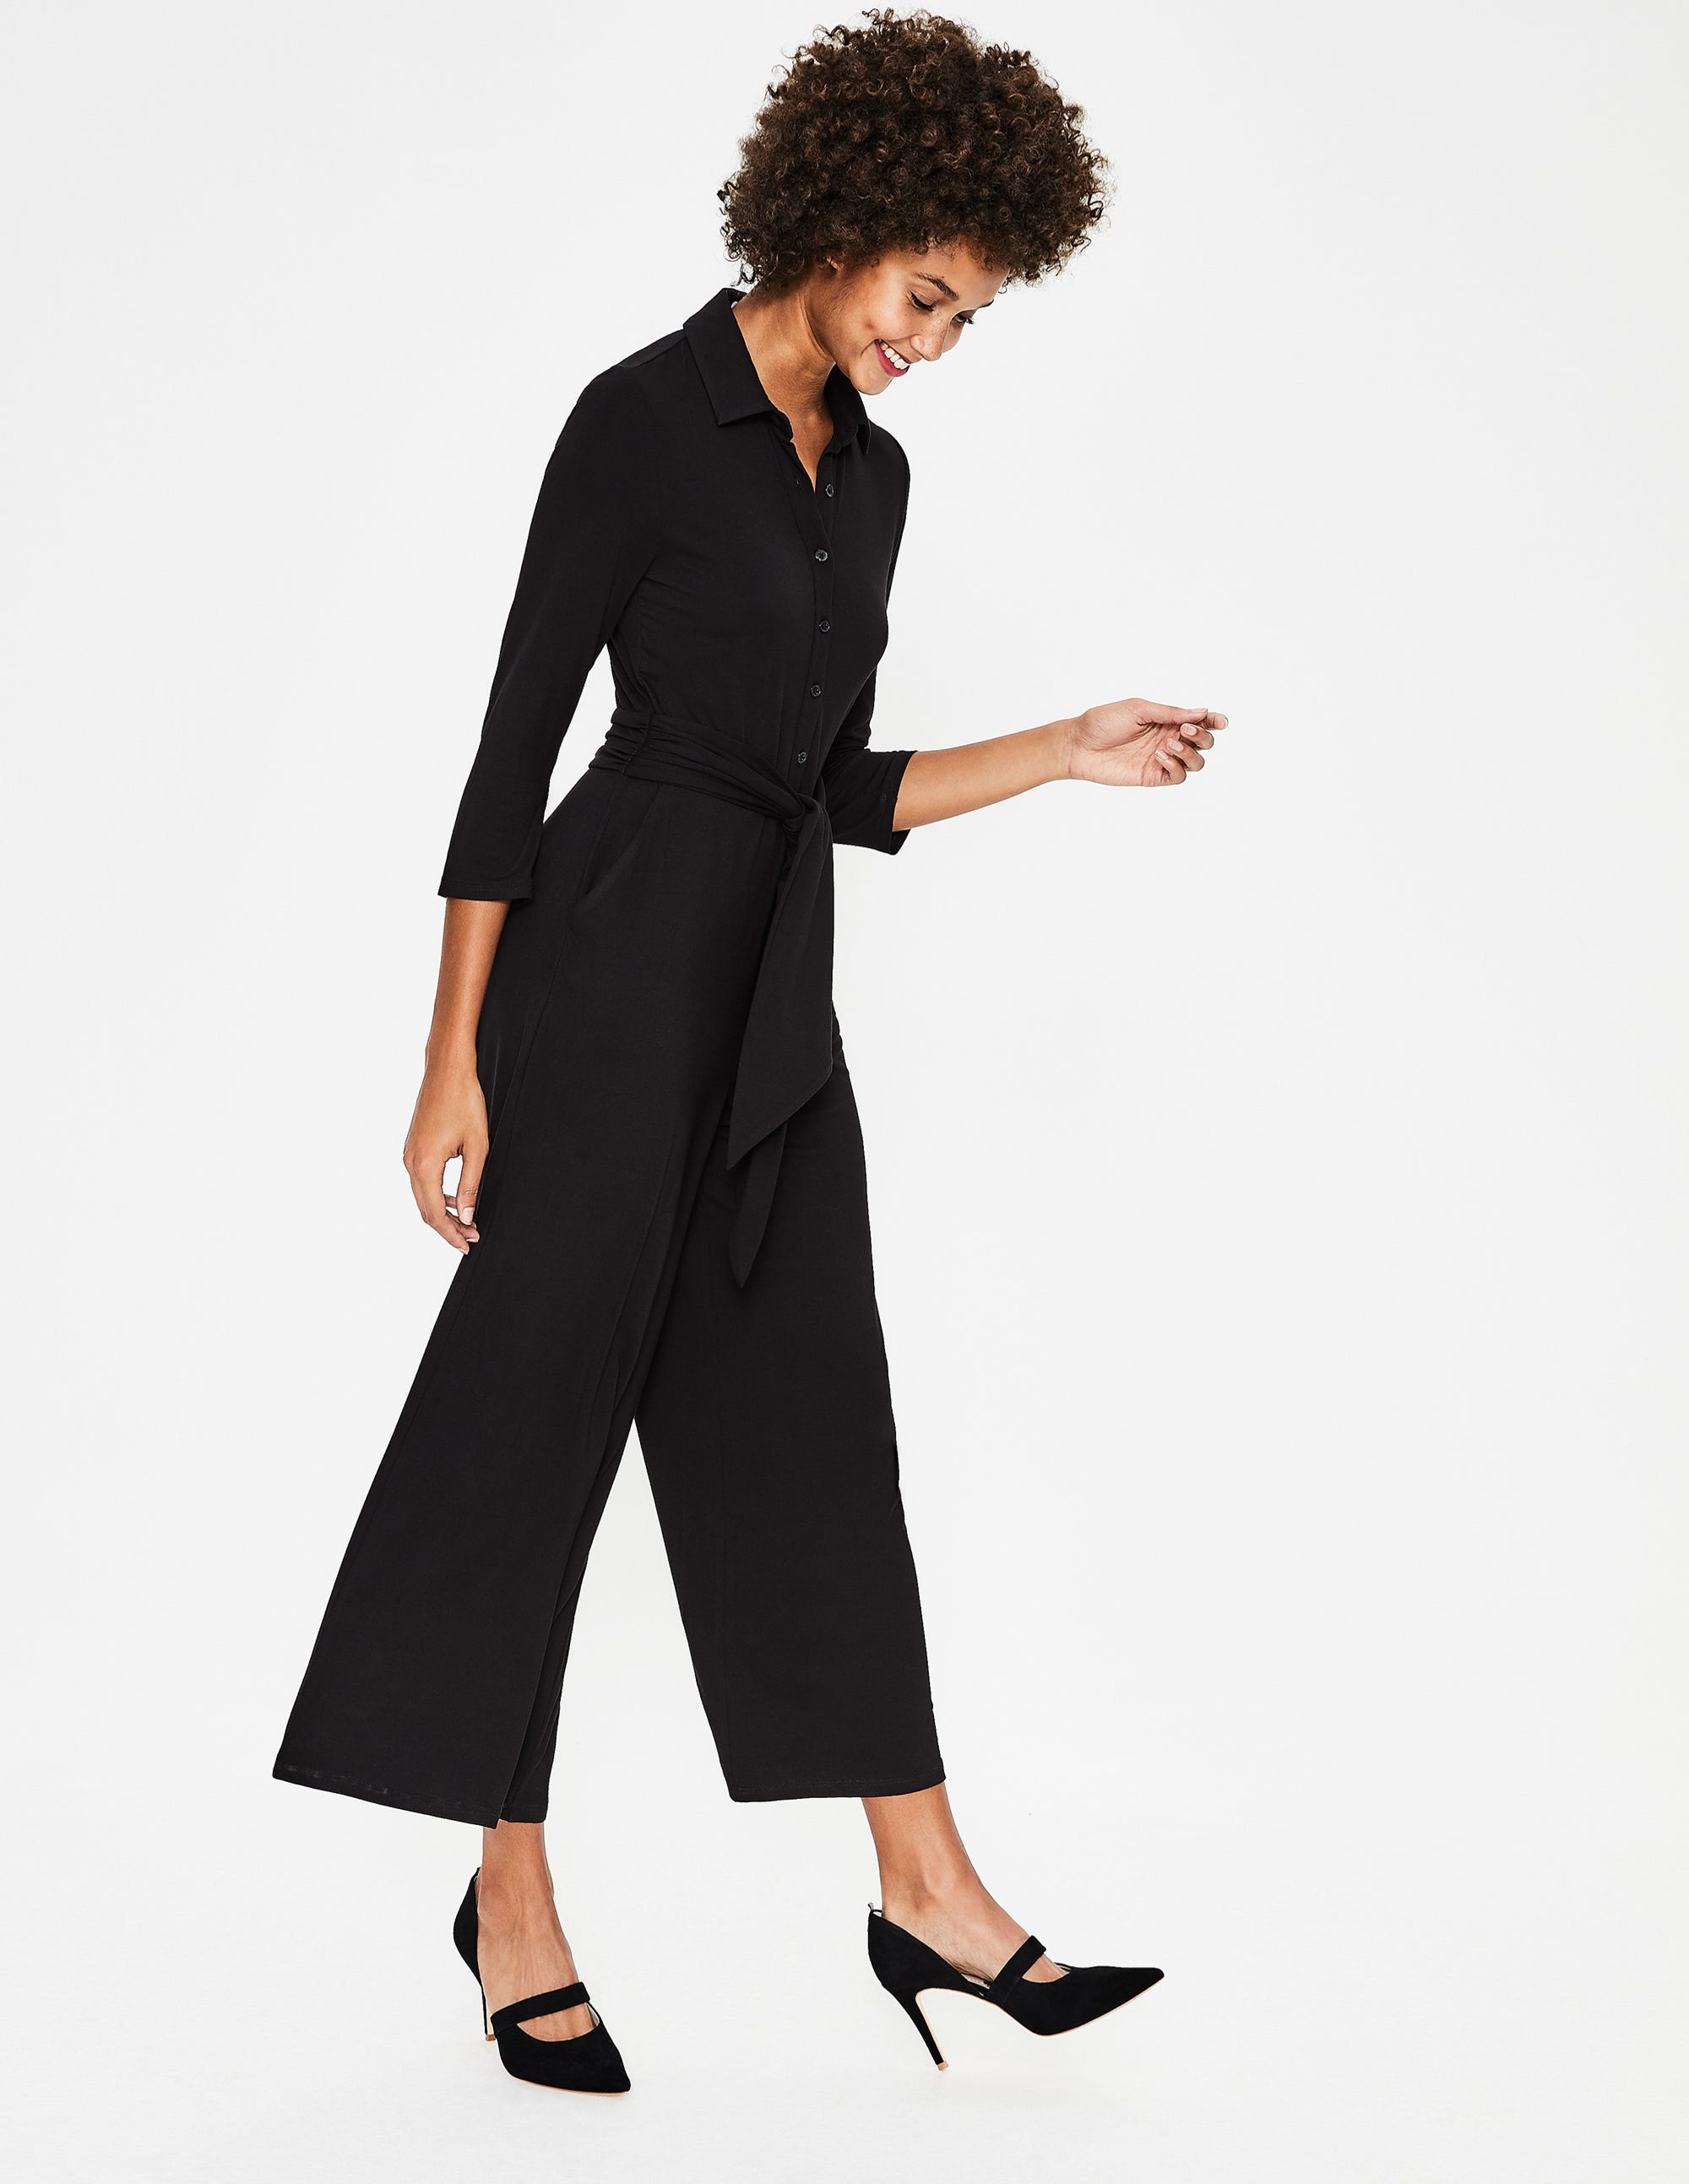 22d251e884a77 Black Jumpsuit Uk Tall